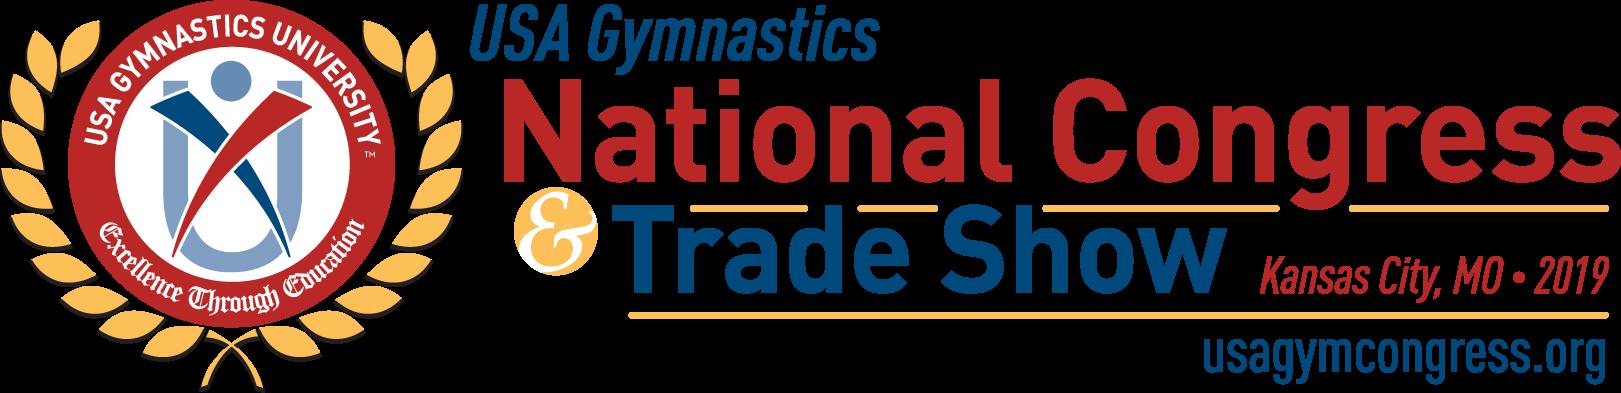 Exhibitors   USA Gymnastics National Congress